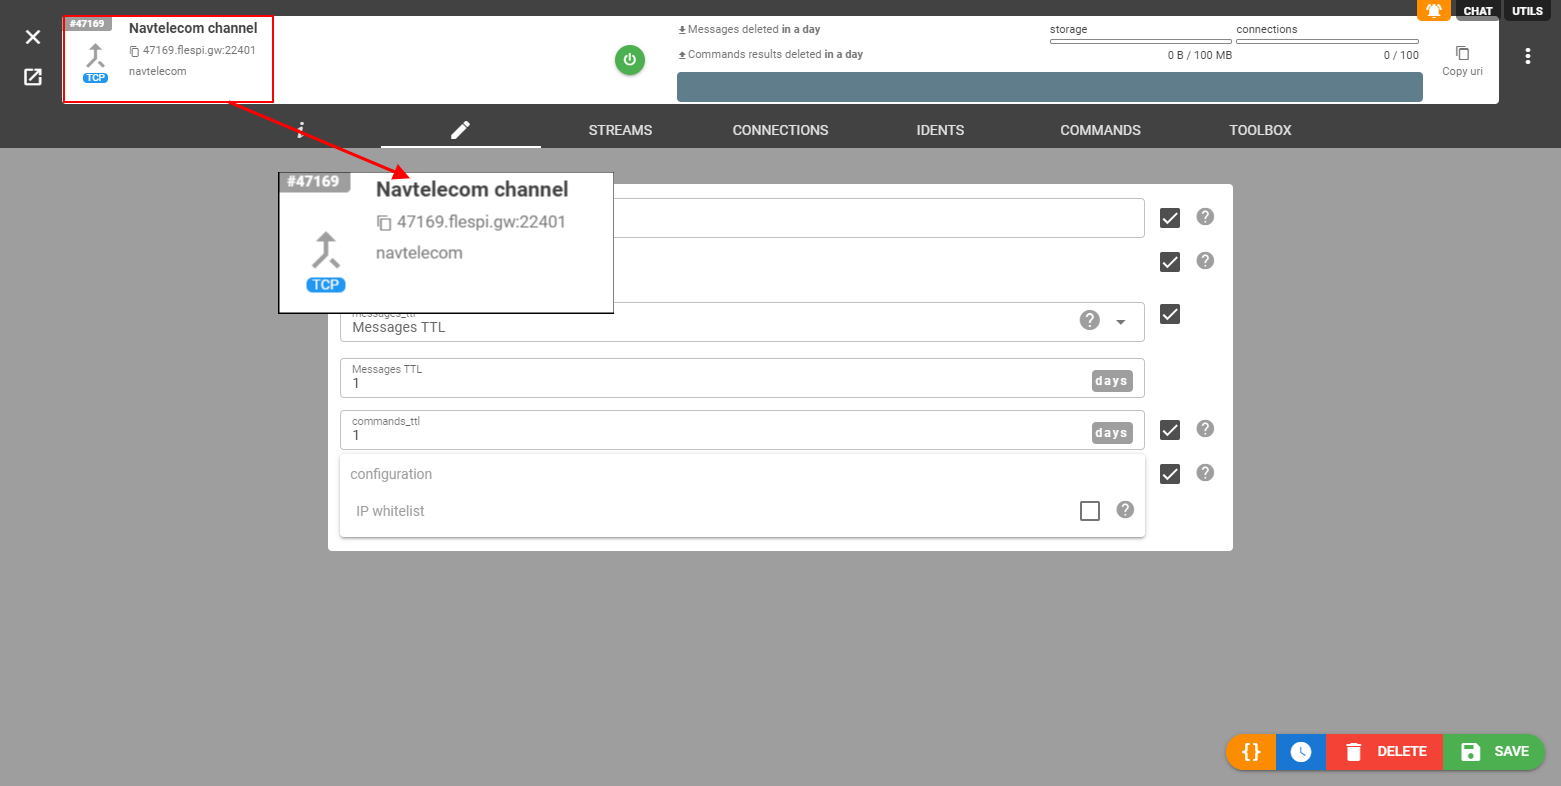 flespi navtelecom channel domain name port